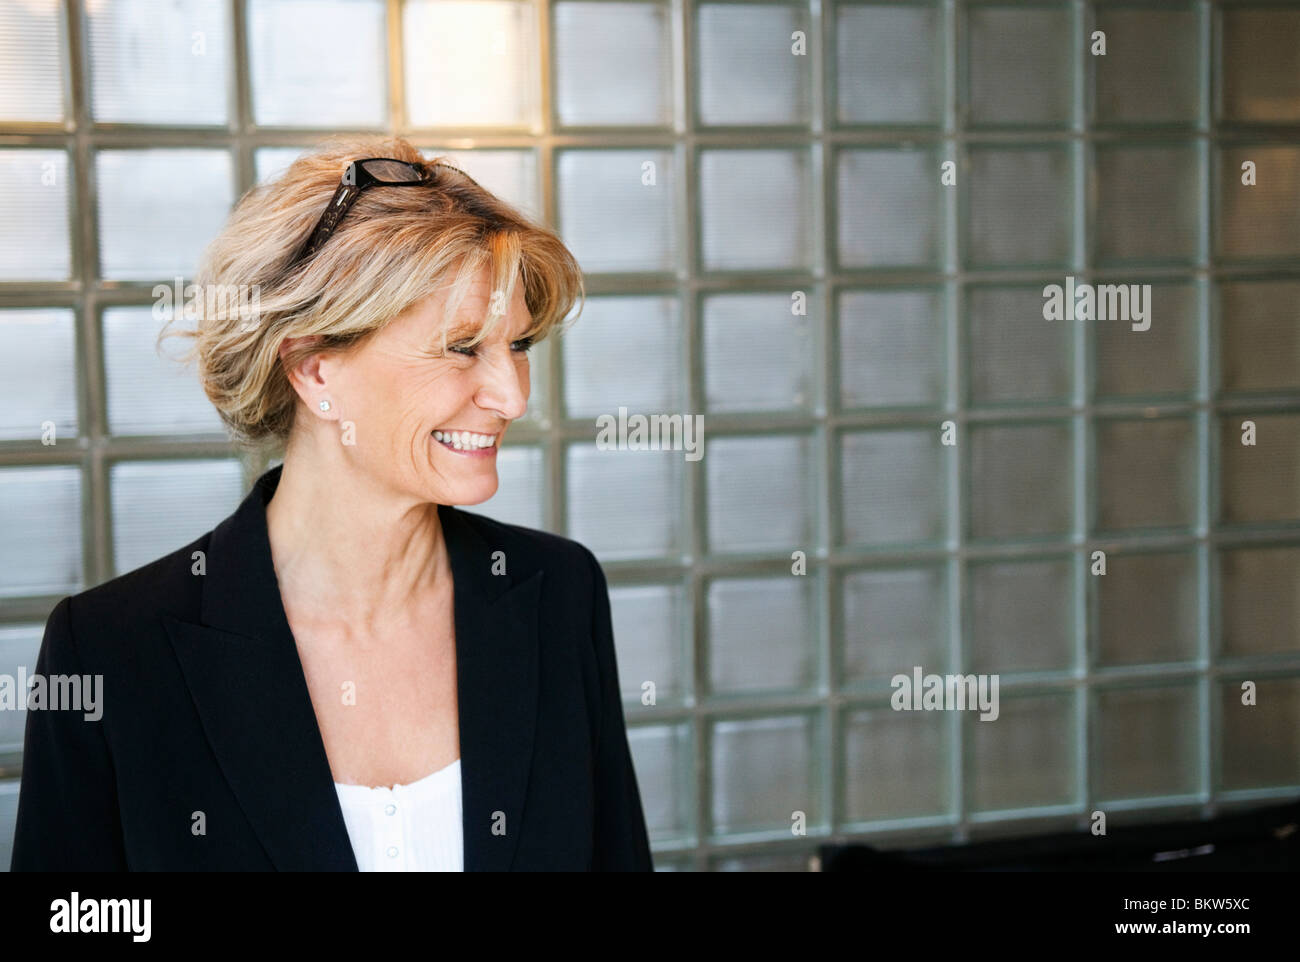 A happy businesswoman - Stock Image